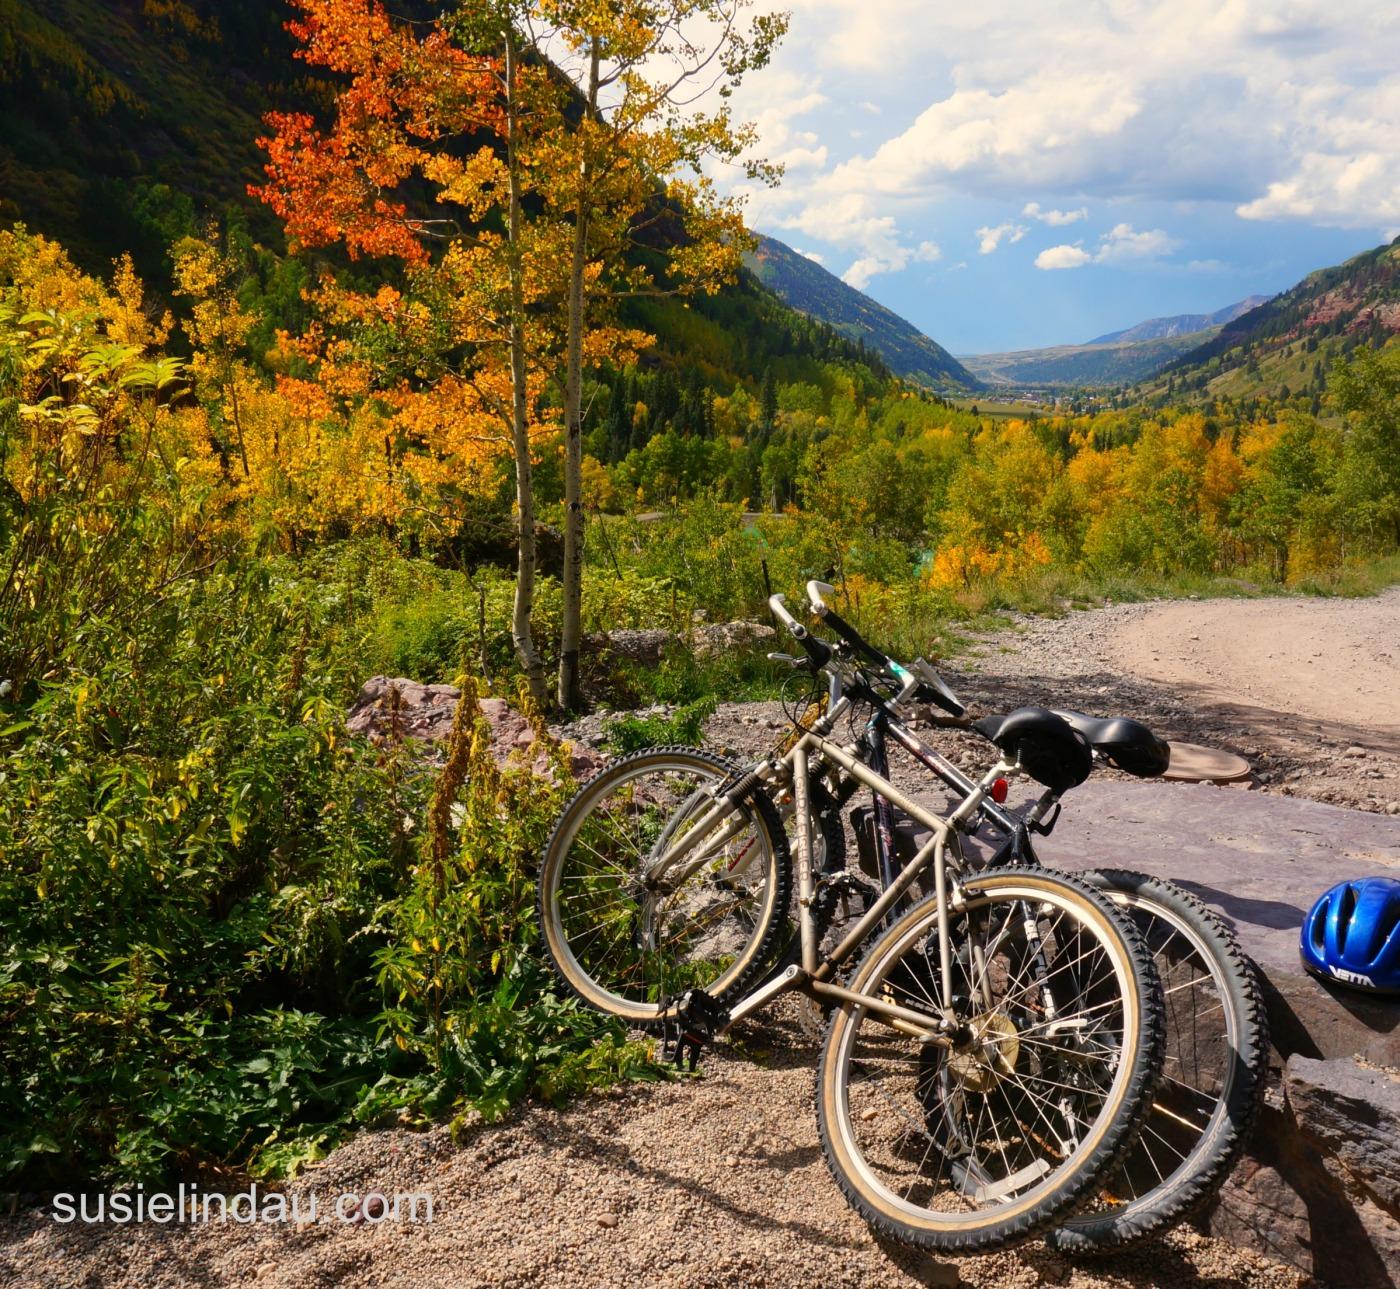 bikes leaning across trail Telluride